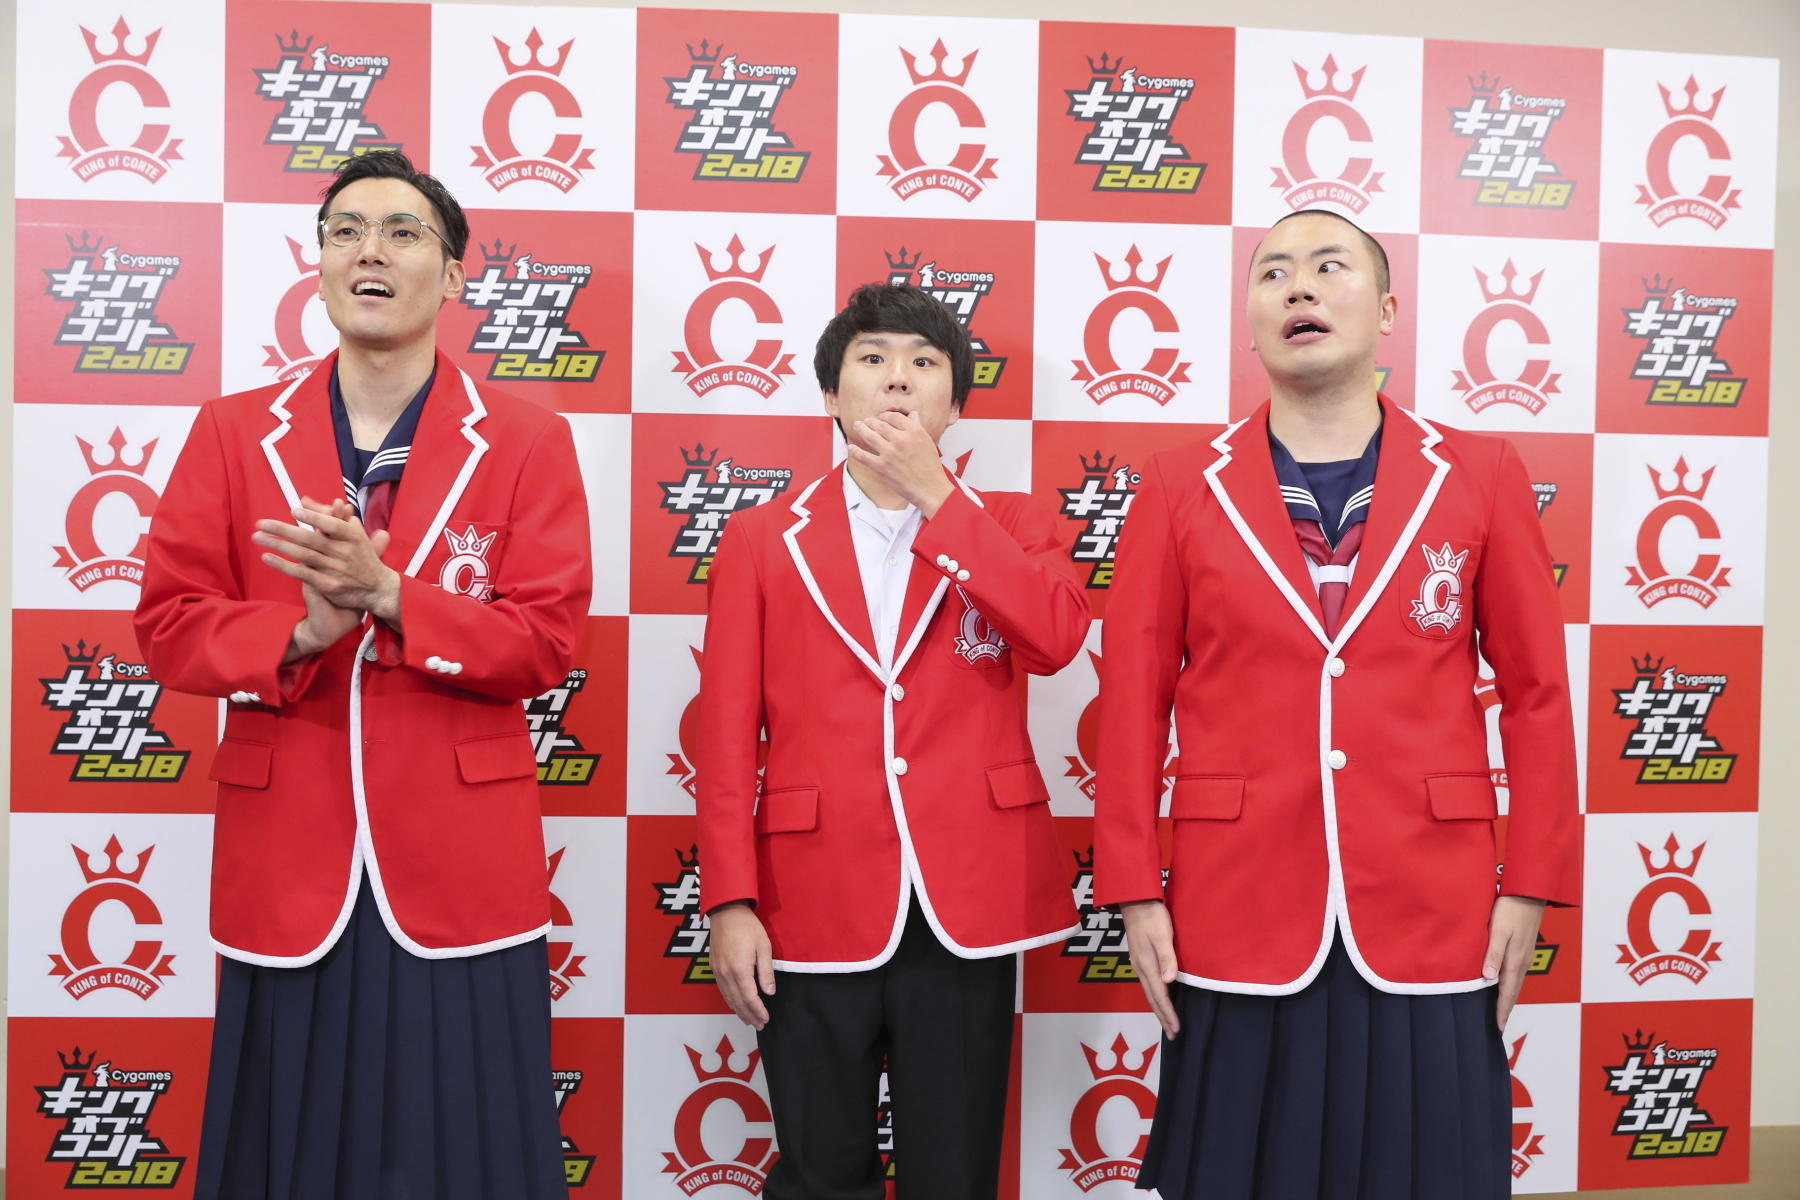 http://news.yoshimoto.co.jp/20180923001415-403a9f364e1eed6098a905a2c63670805bfc6608.jpg